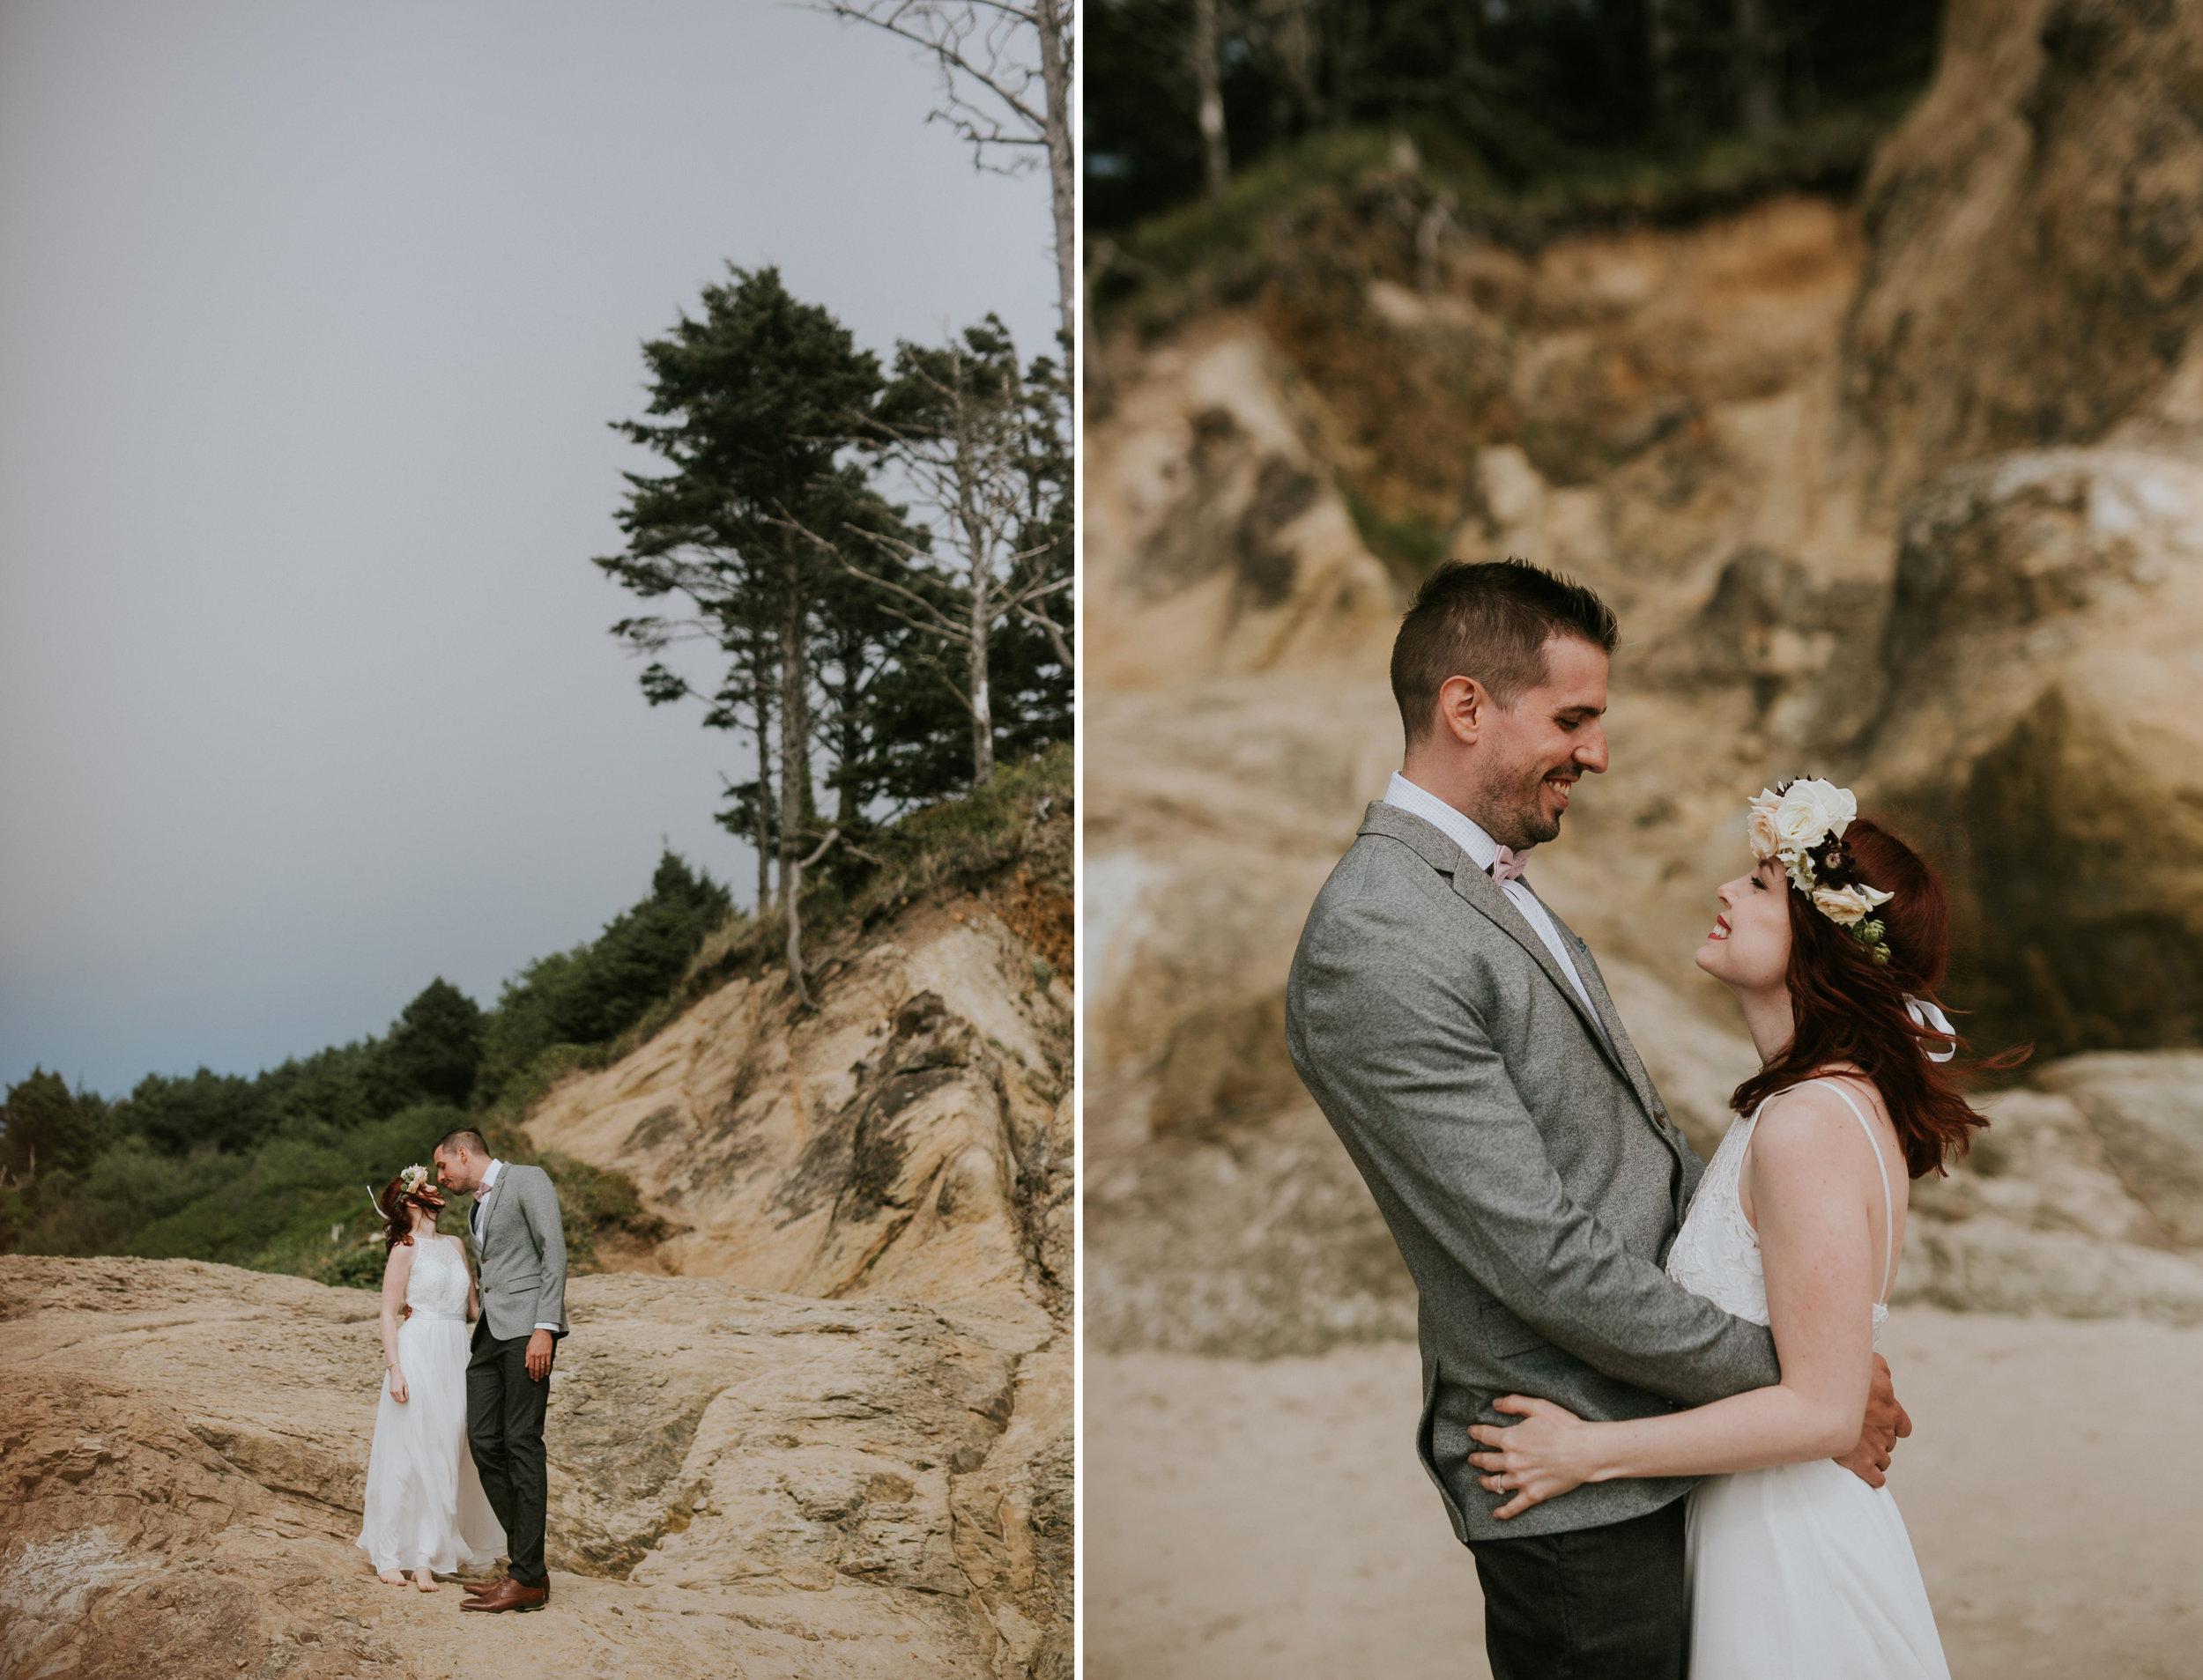 Hug Point, Oregon Intimate Elopement- The soft Season Photograph